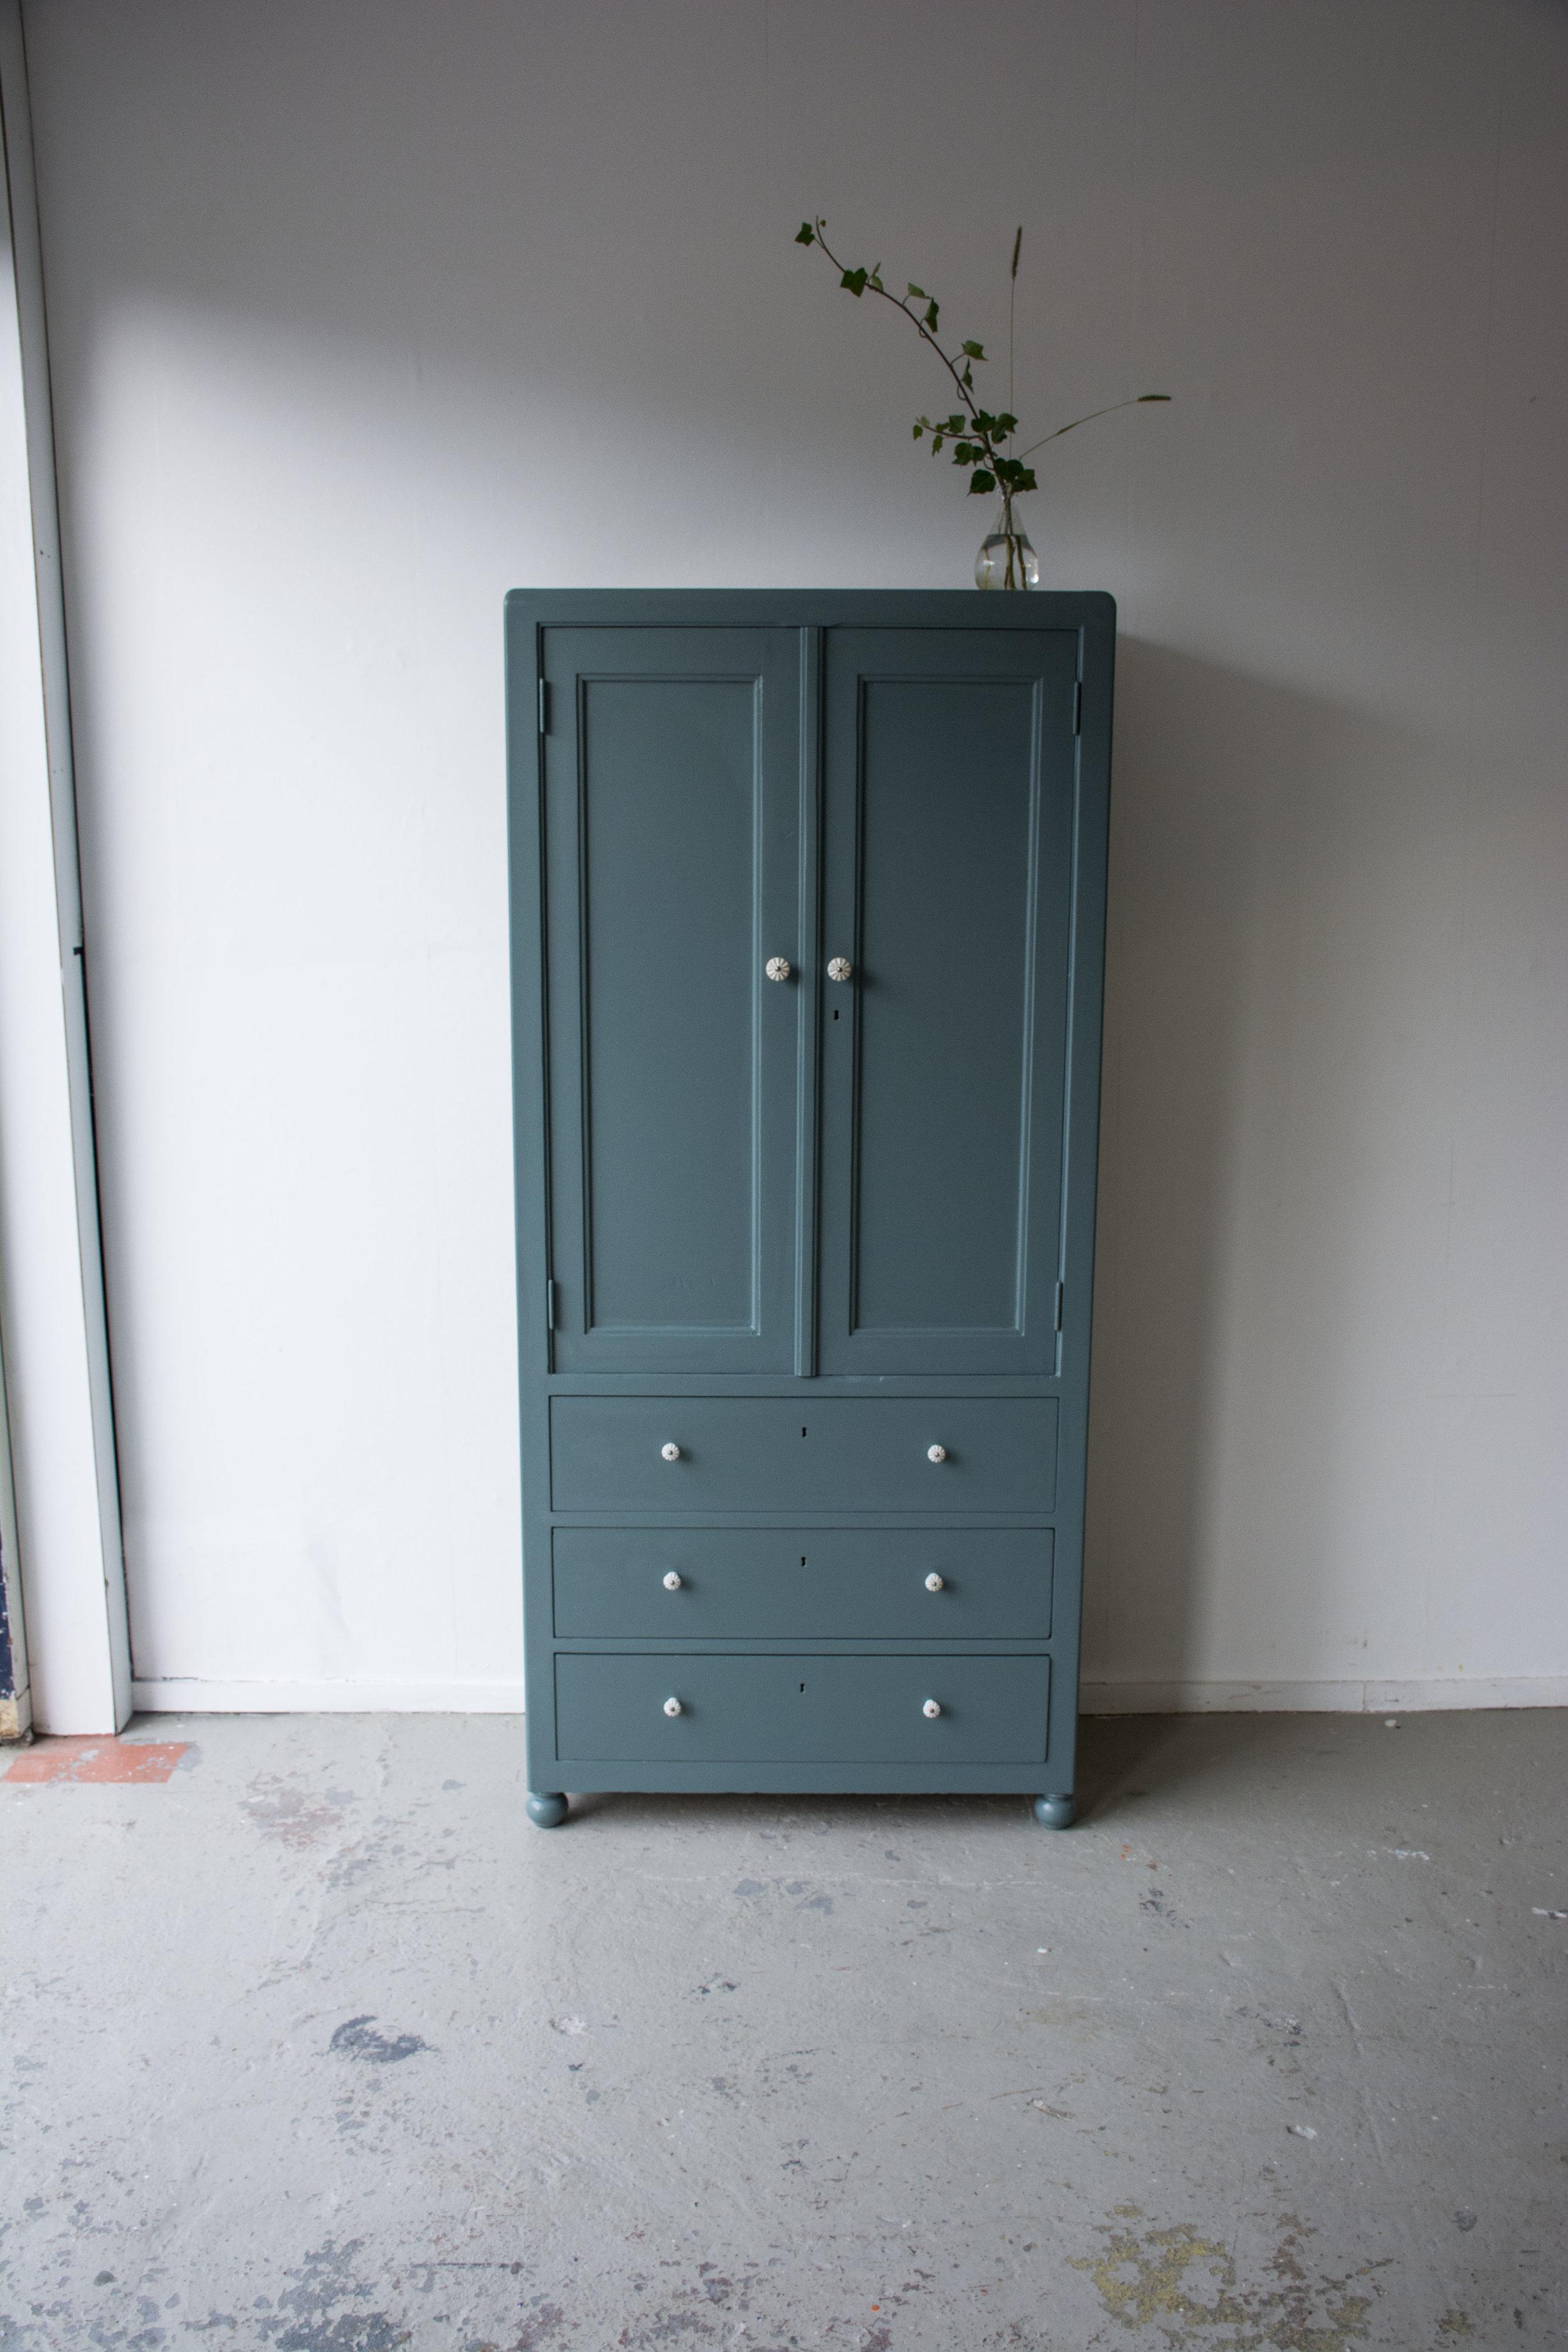 Inchyra kledingkast met 3 laden - Firma Zoethout_4.jpg